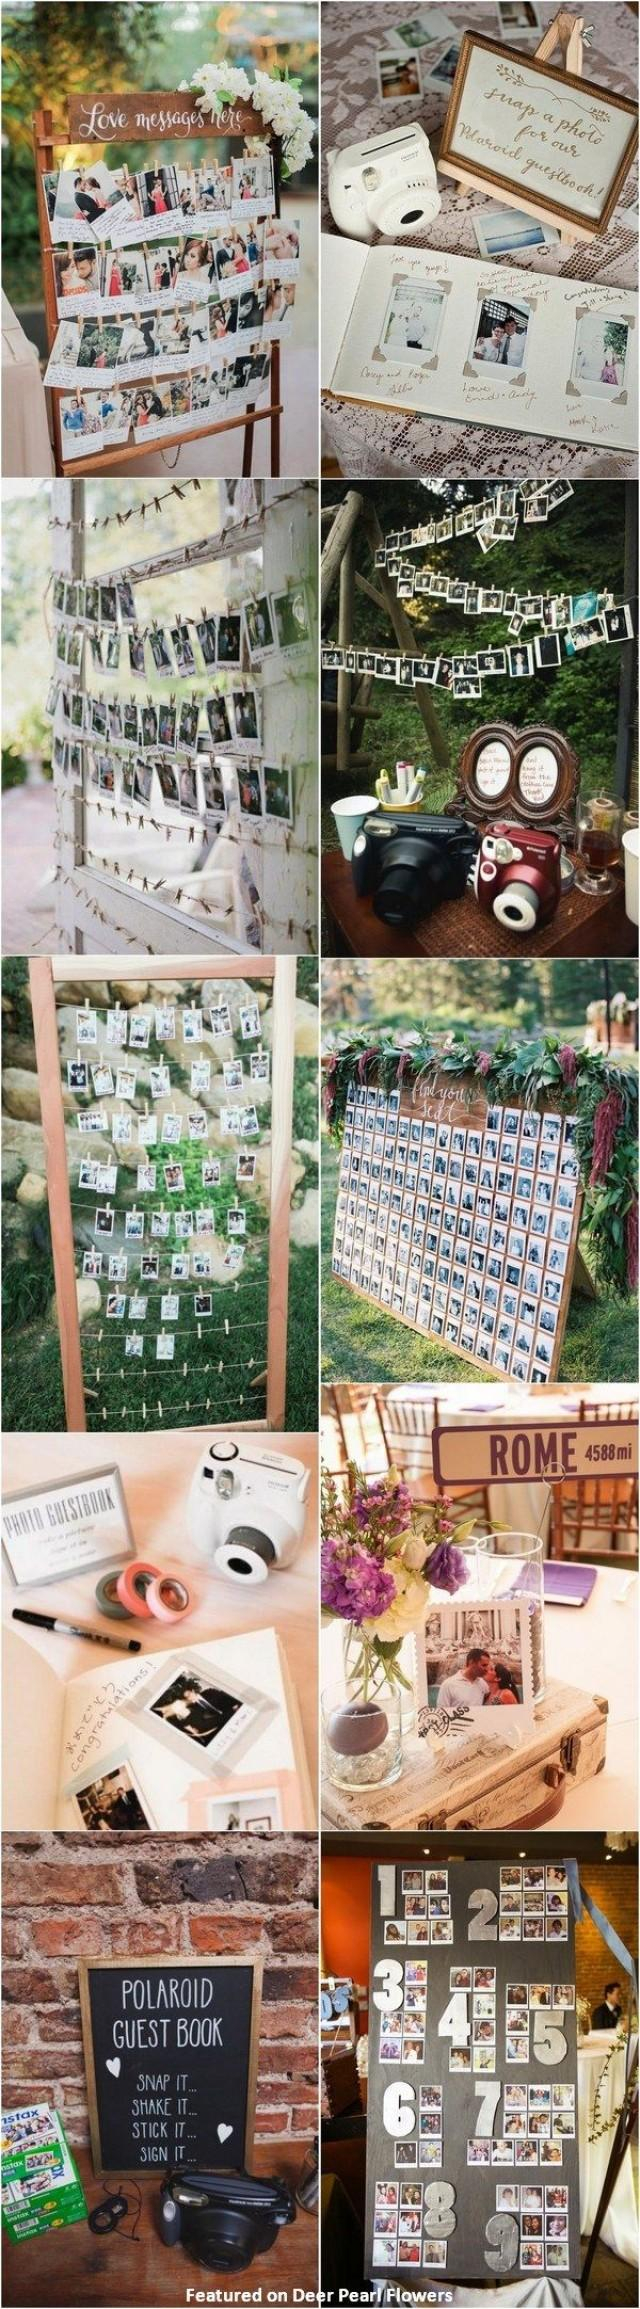 Poloroid Wedding Ideas 30 Creative Polaroid Wedding Ideas Youll Love 2746704 Weddbook